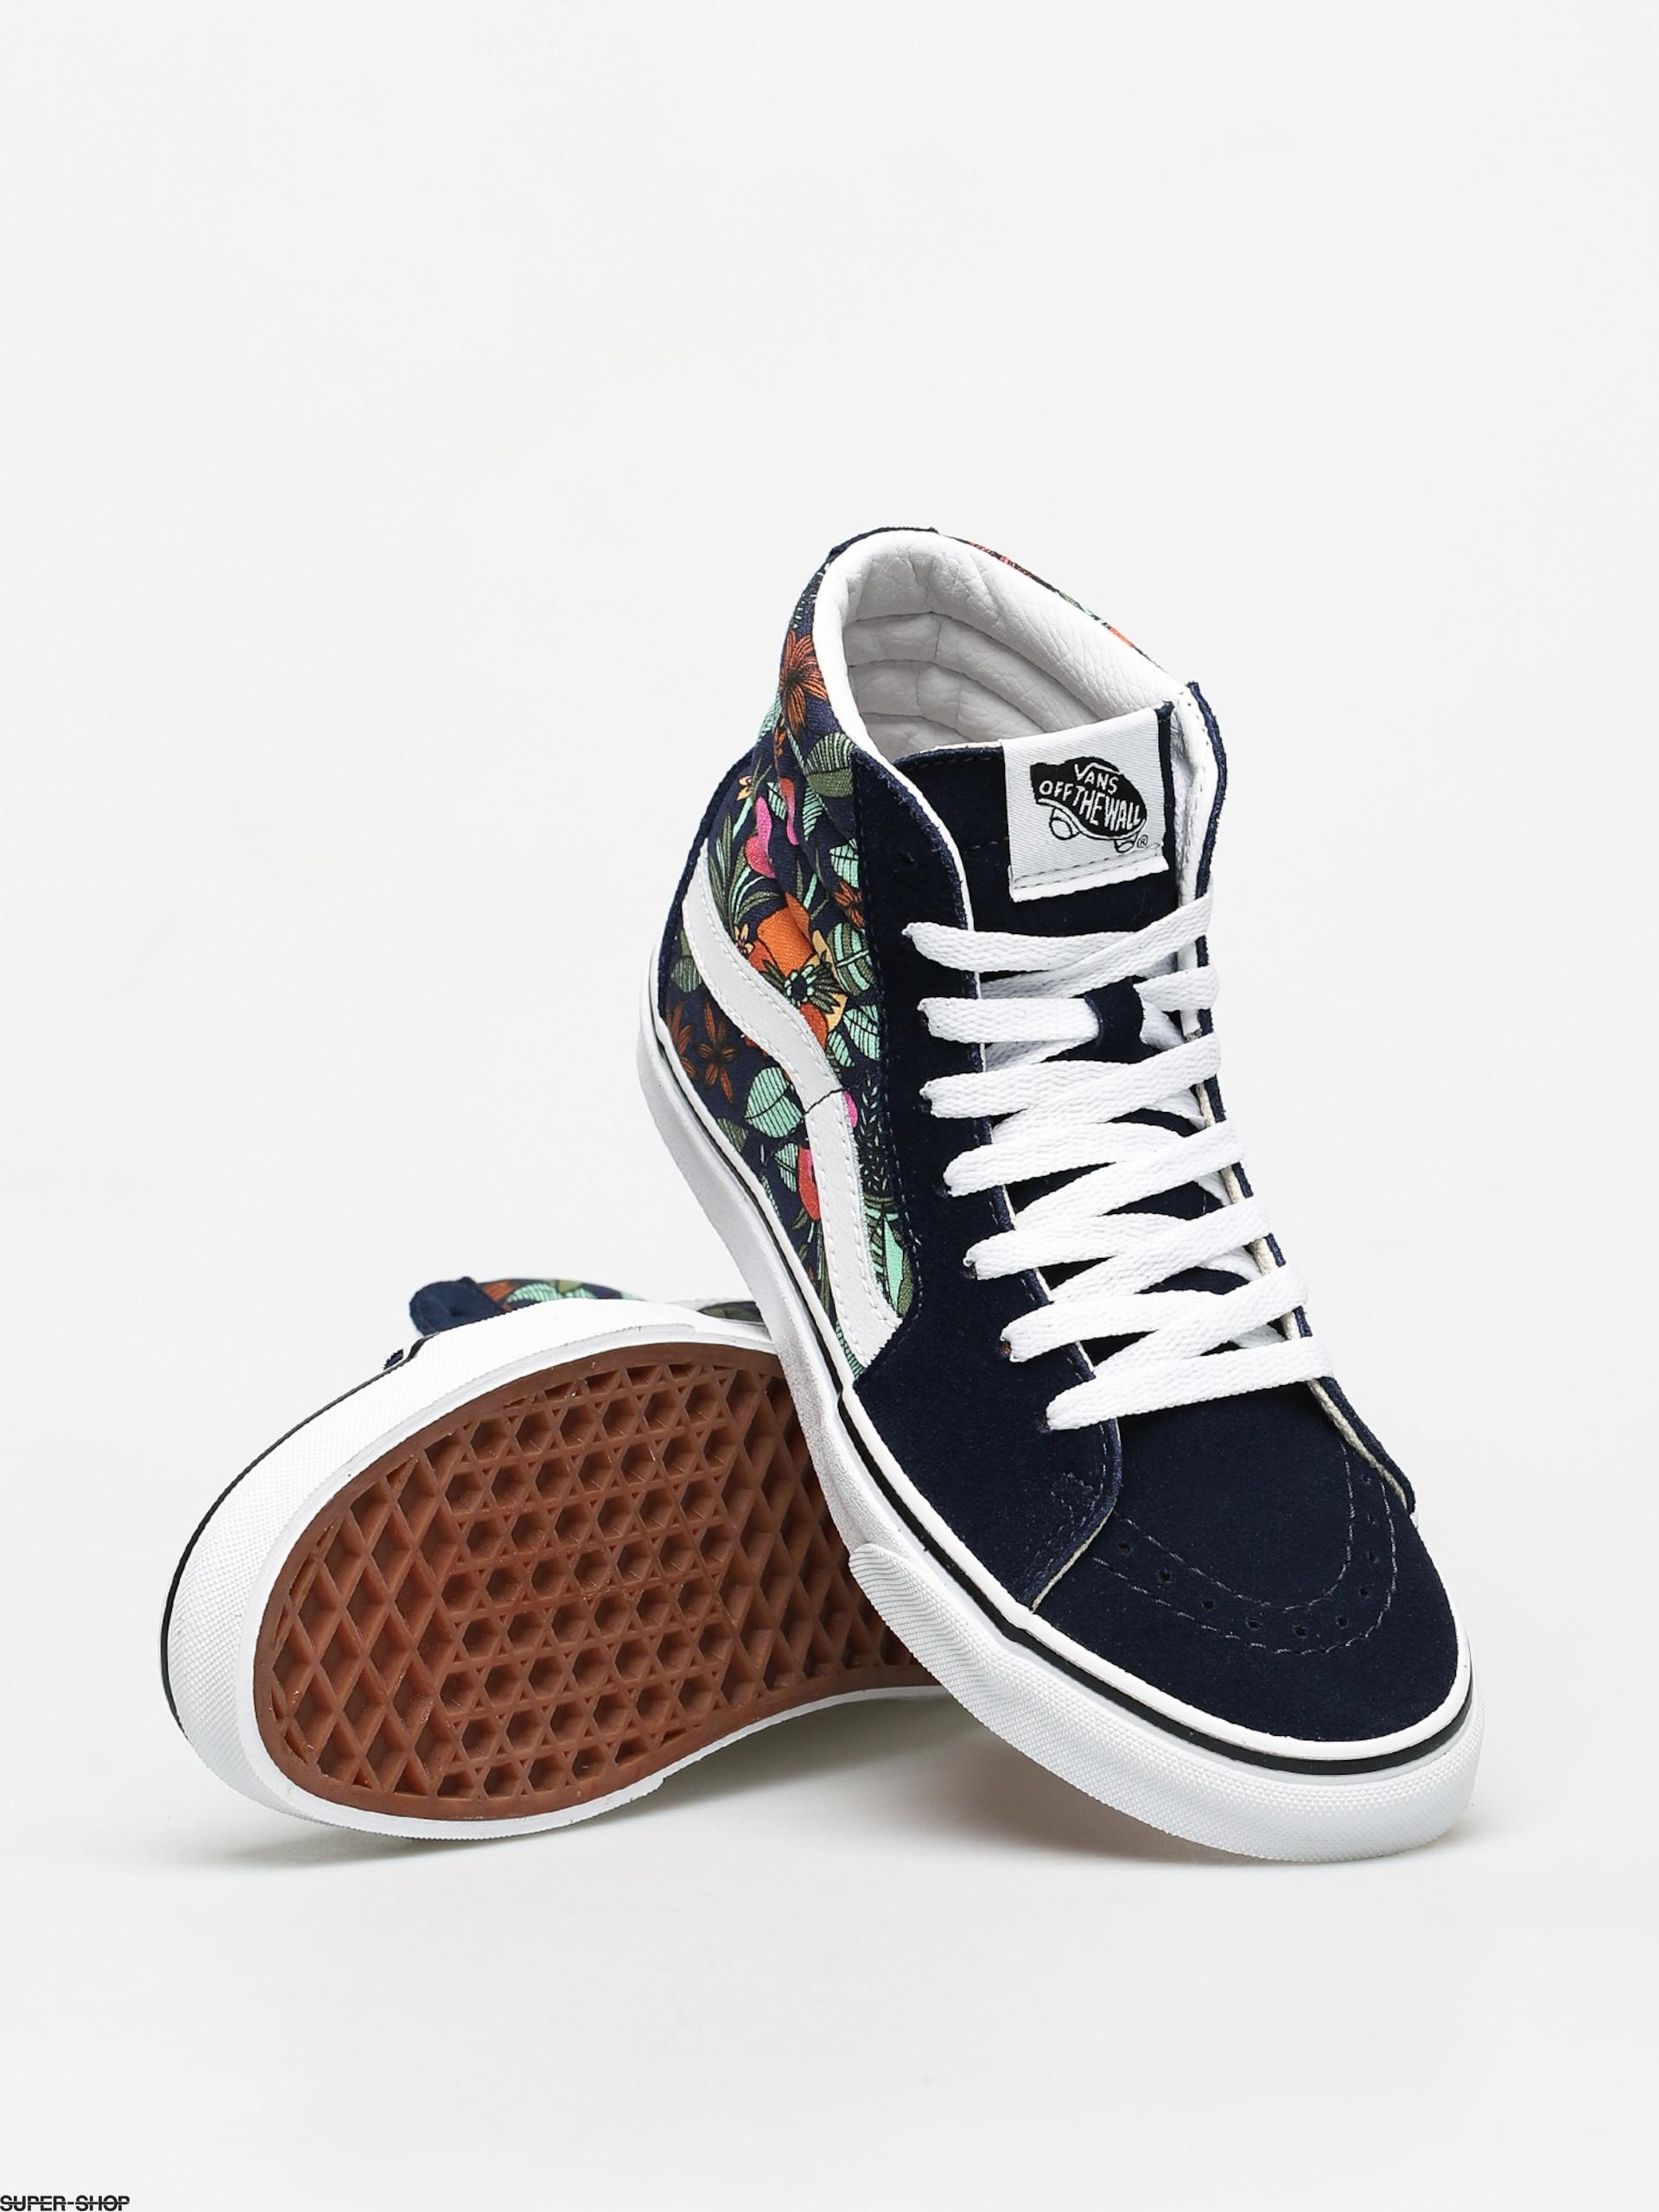 Vans Sk8 Hi Shoes (multi tropic)